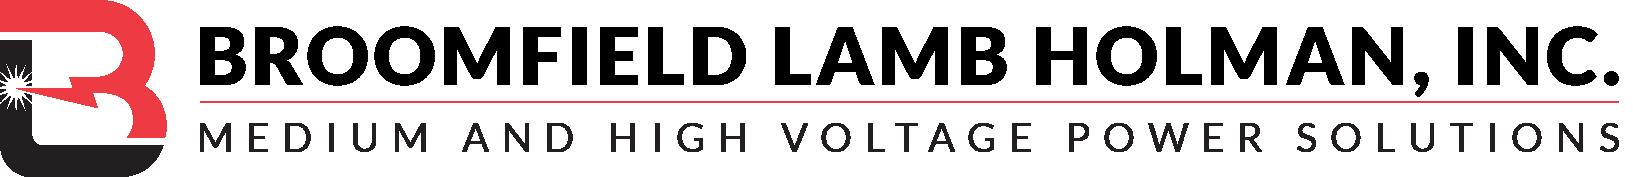 Broomfield Lamb Holman, Inc. brand identity logo